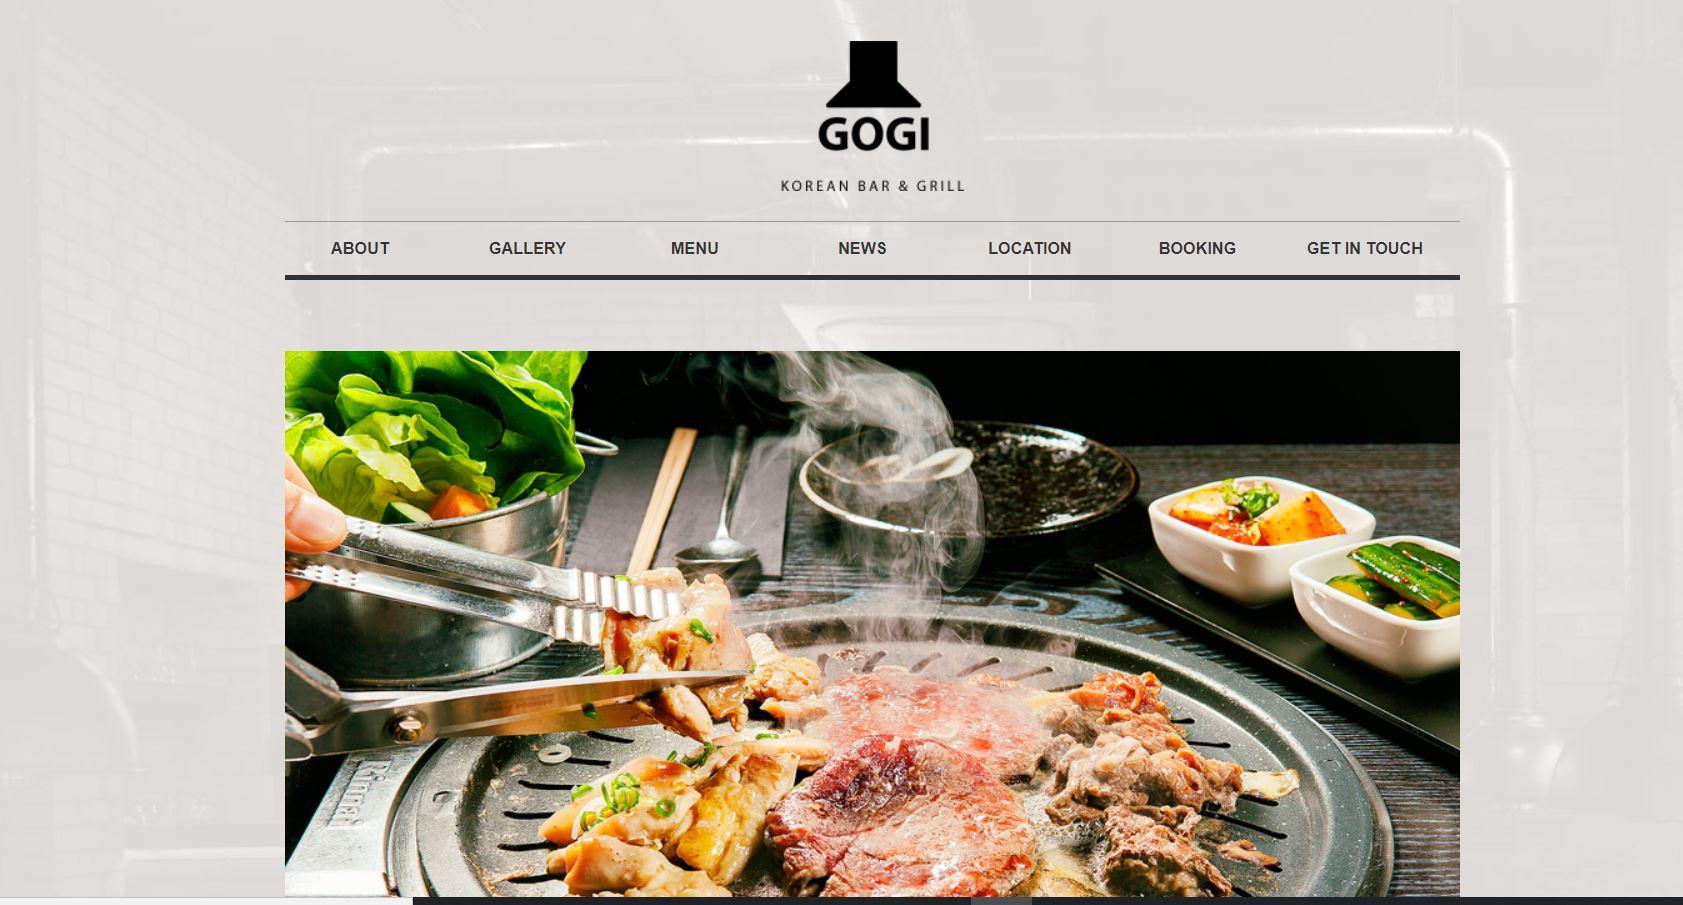 Gogi Korean Bar And Grill